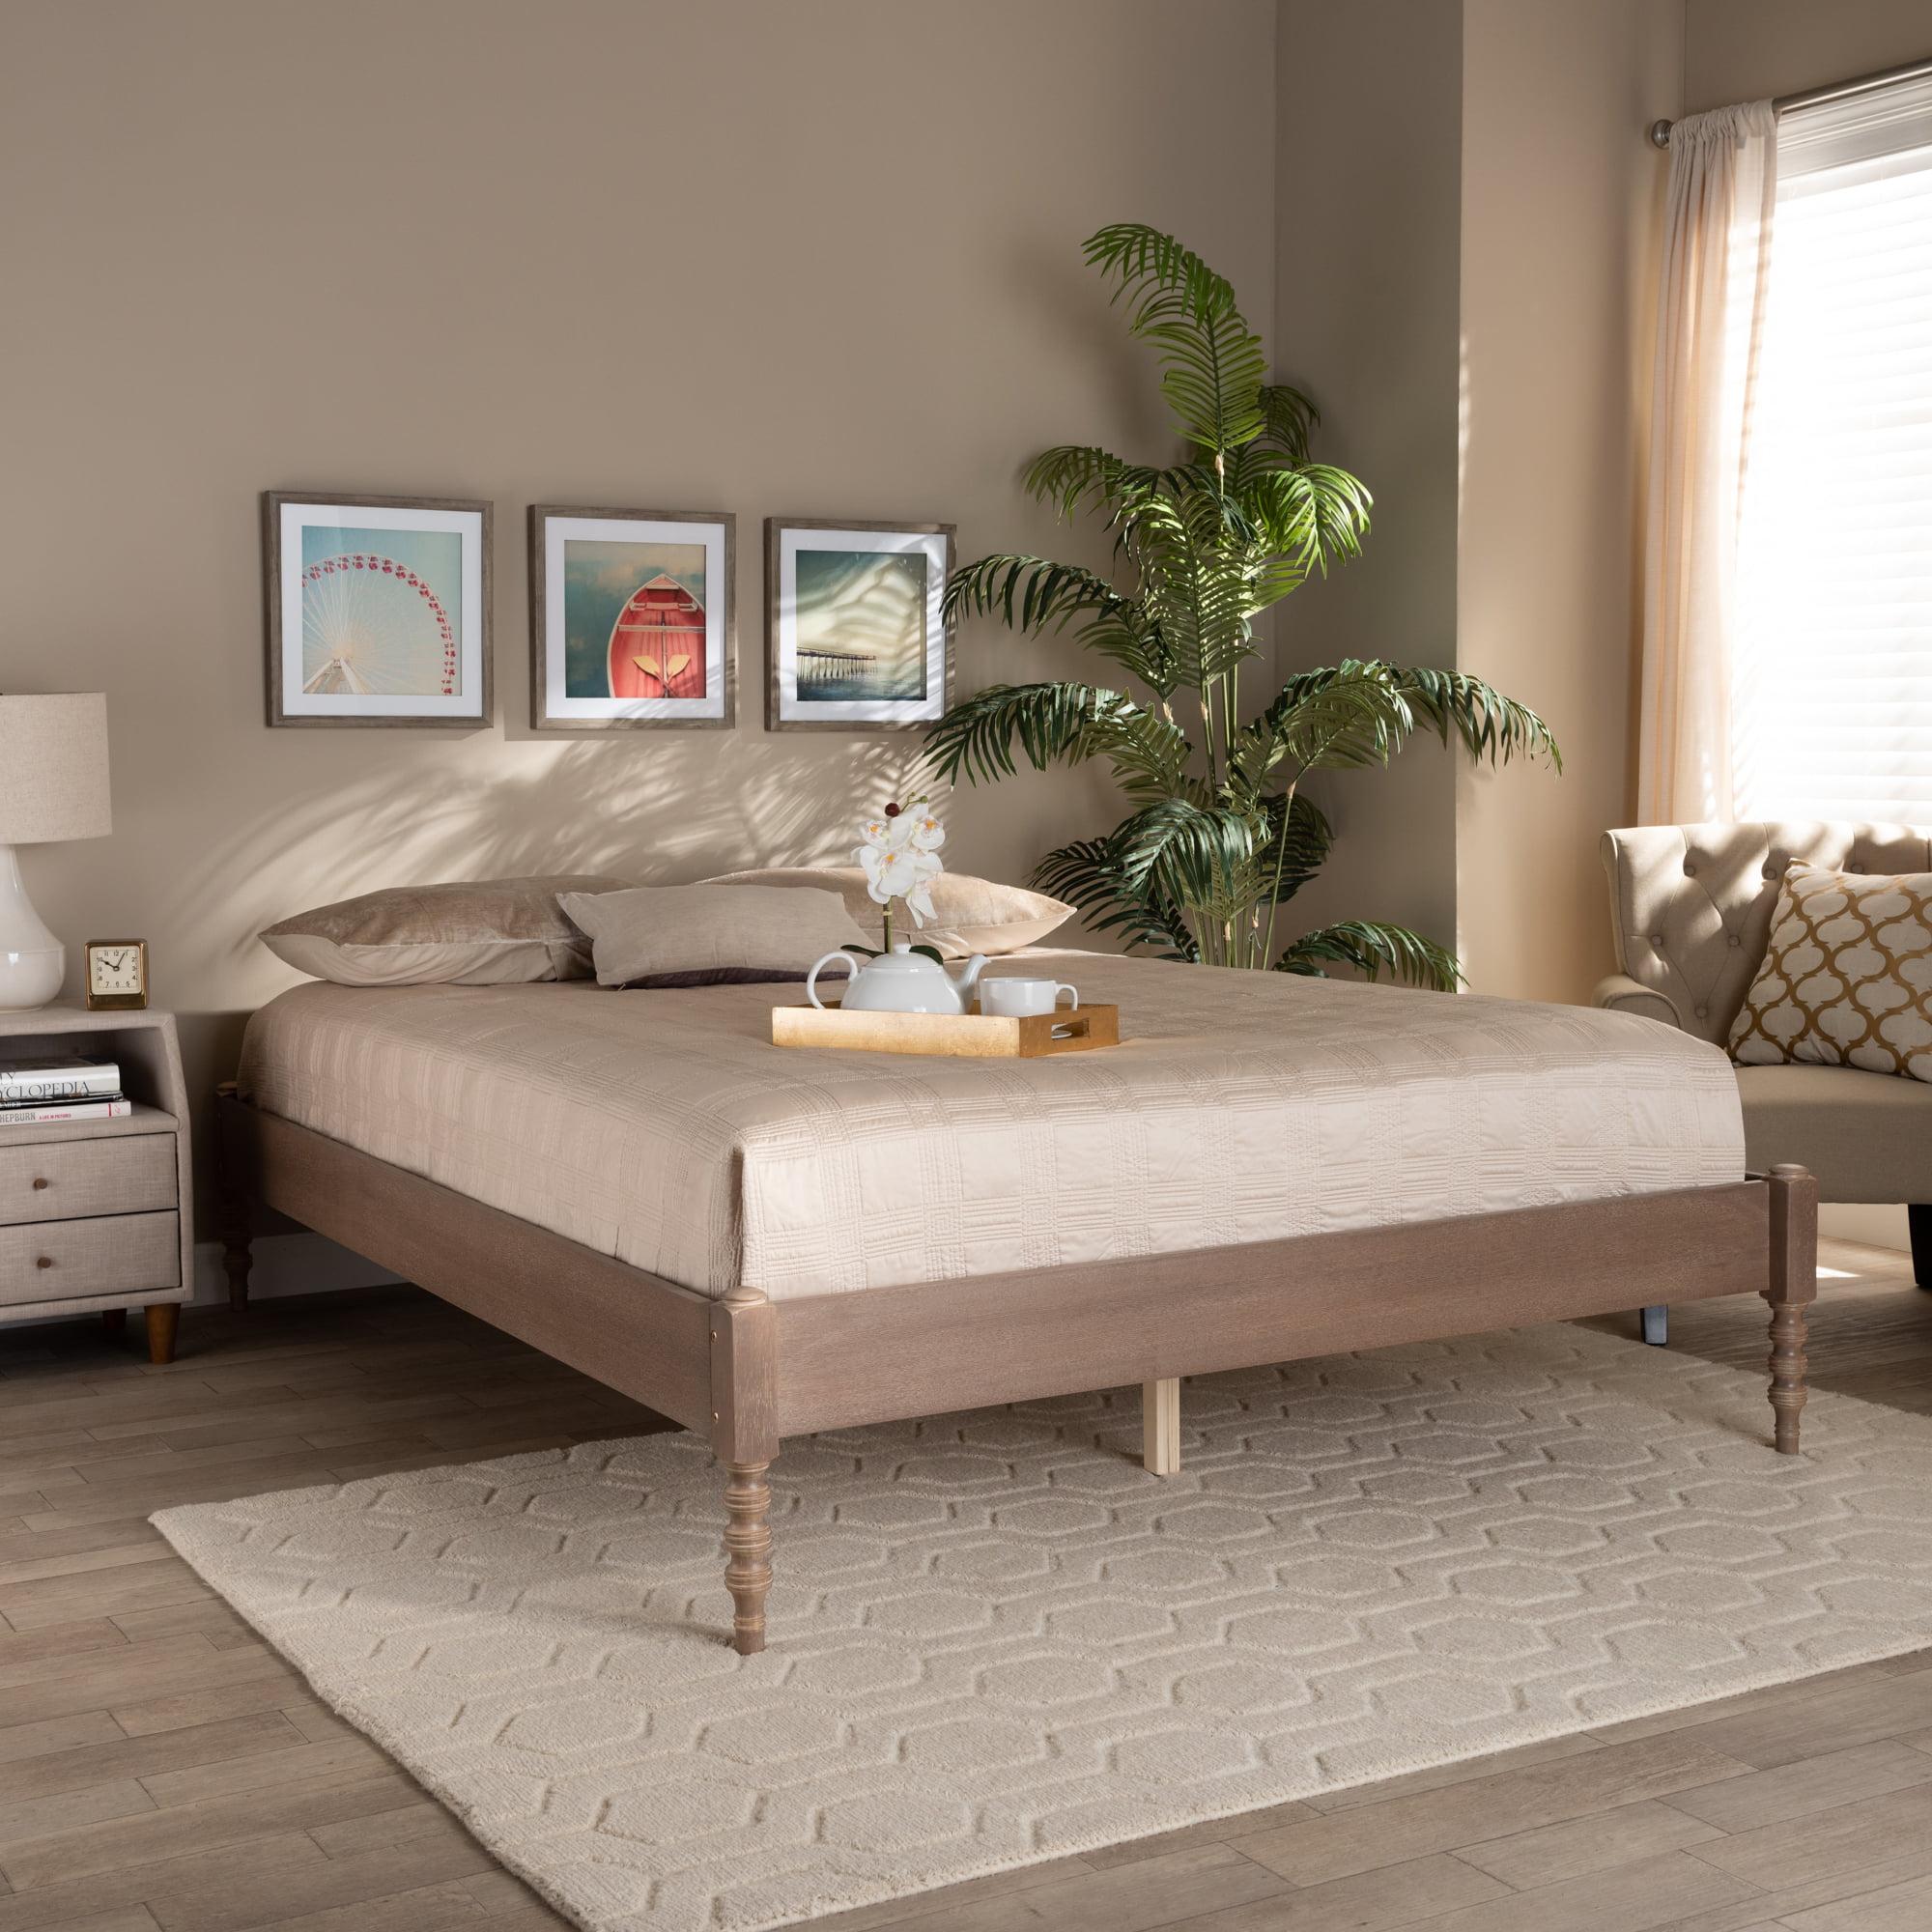 Baxton Studio Cielle French Bohemian Antique Oak Finished Wood Full Size Platform Bed Frame Walmart Com Walmart Com